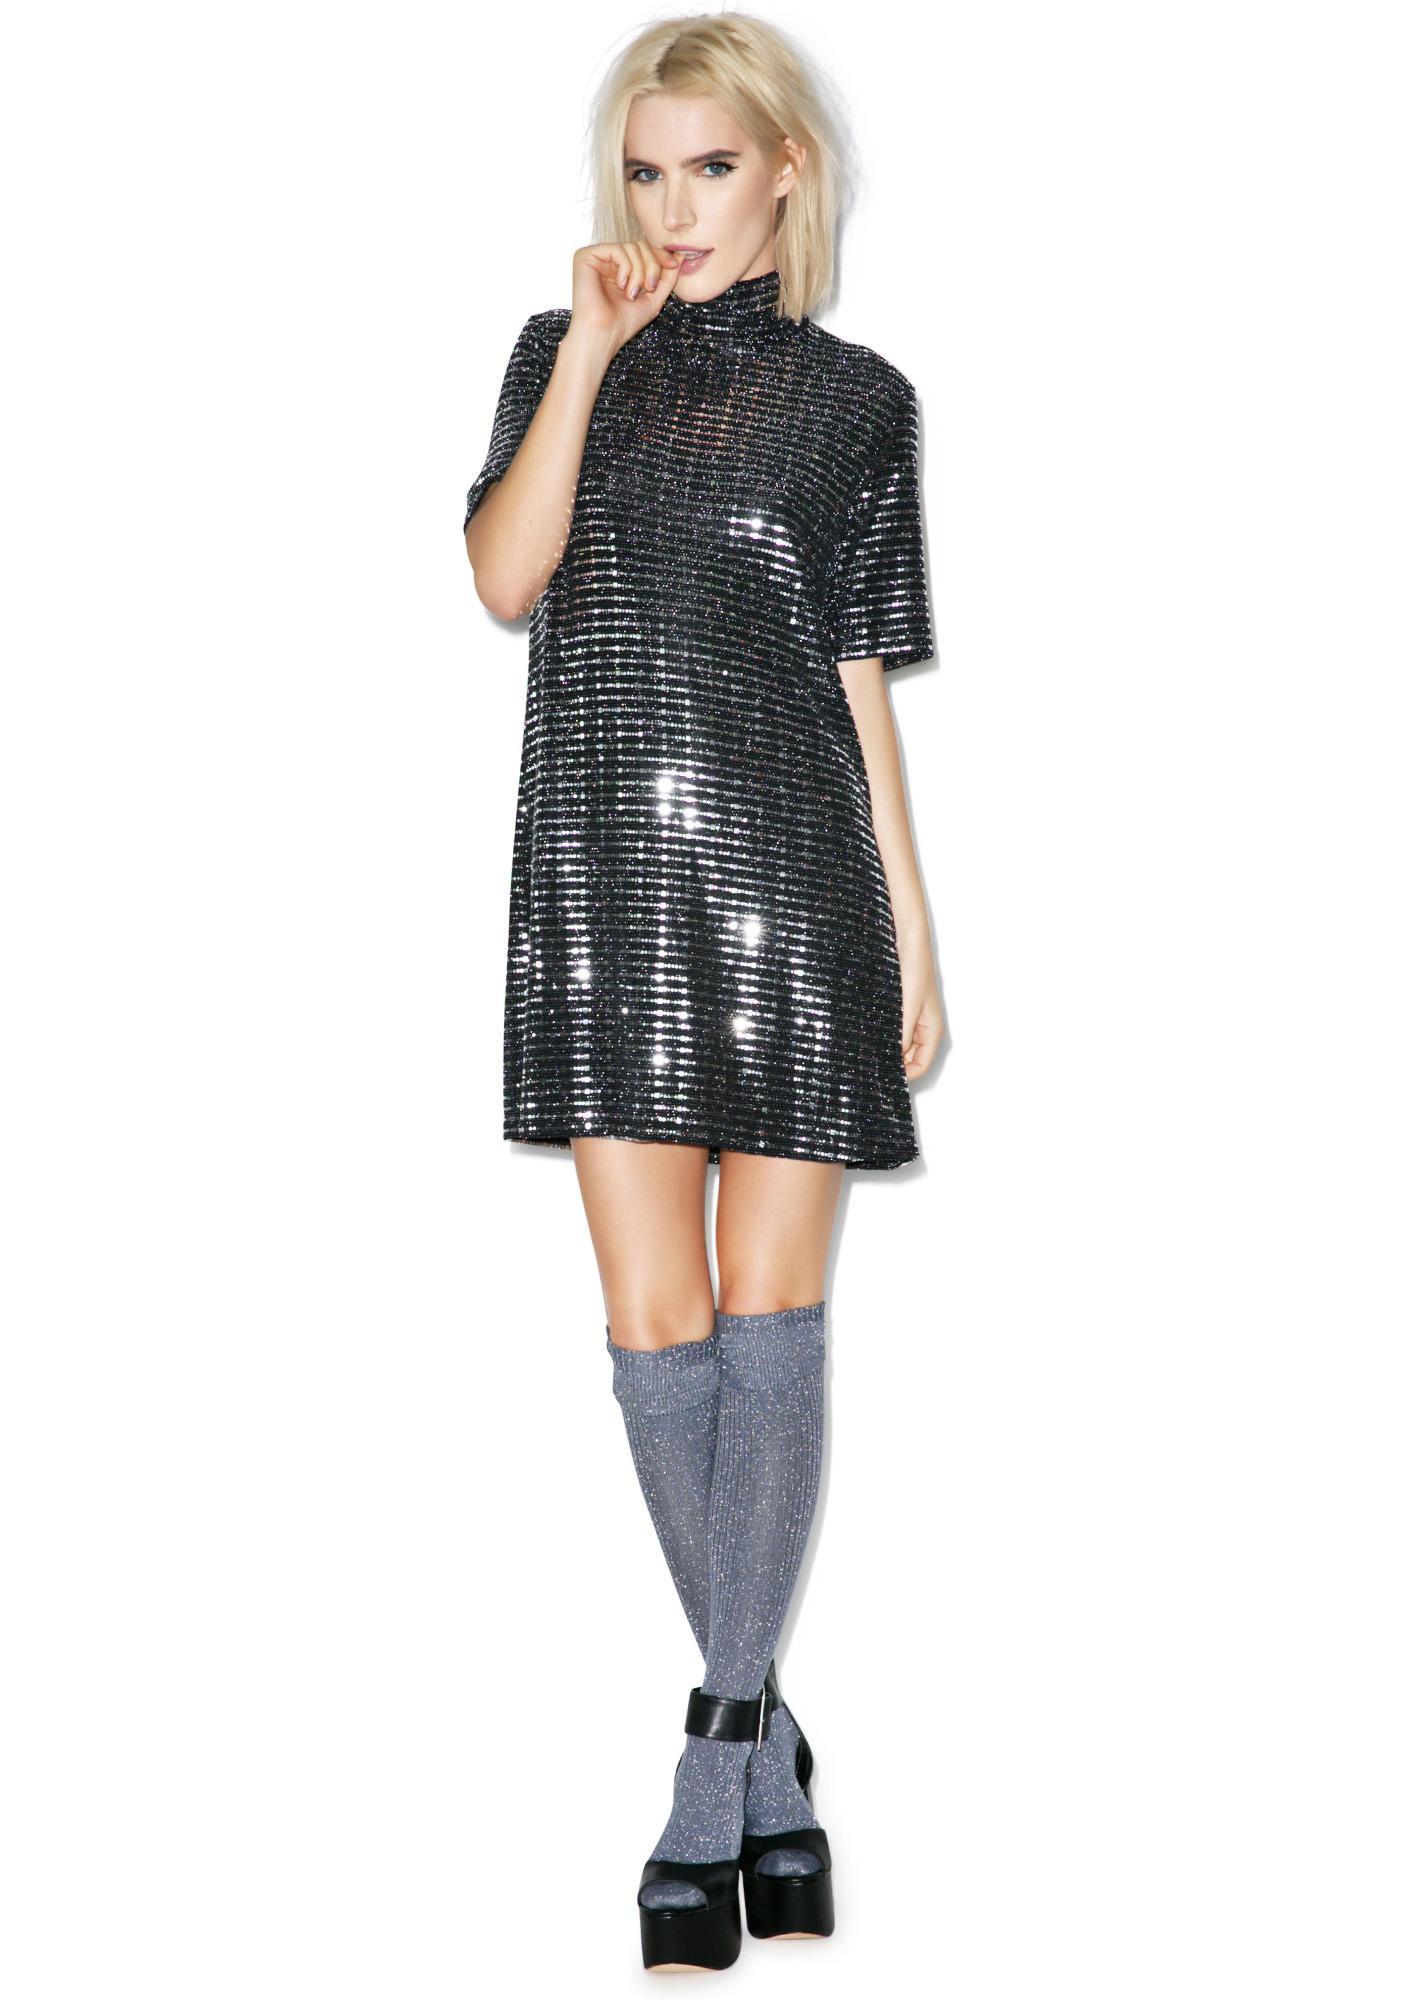 All Shook Up Sequin Dress